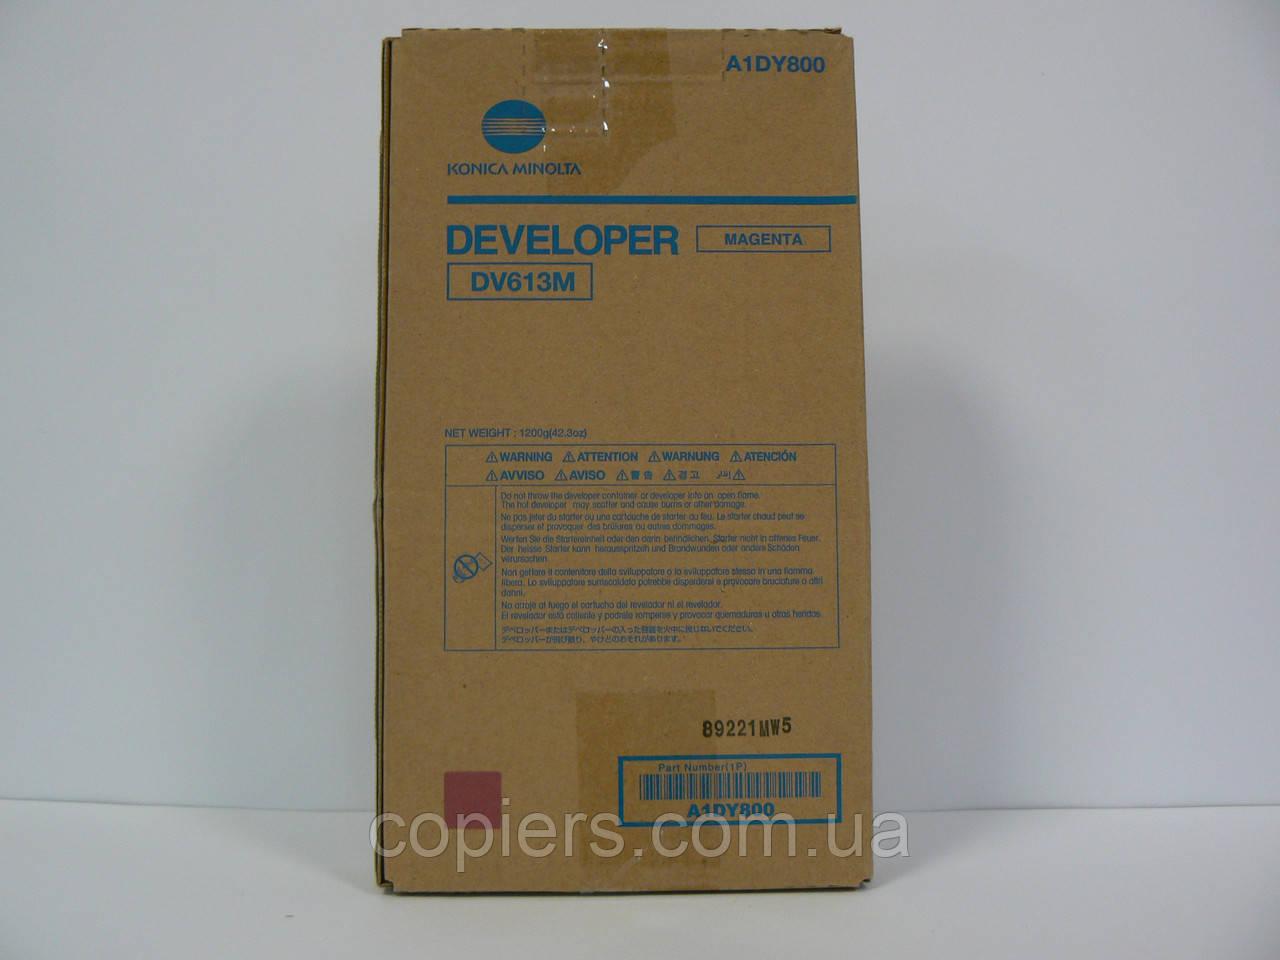 Developer DV613 M Konica Minolta Bizhub PRESS C8000, dv-613m, A1DY800